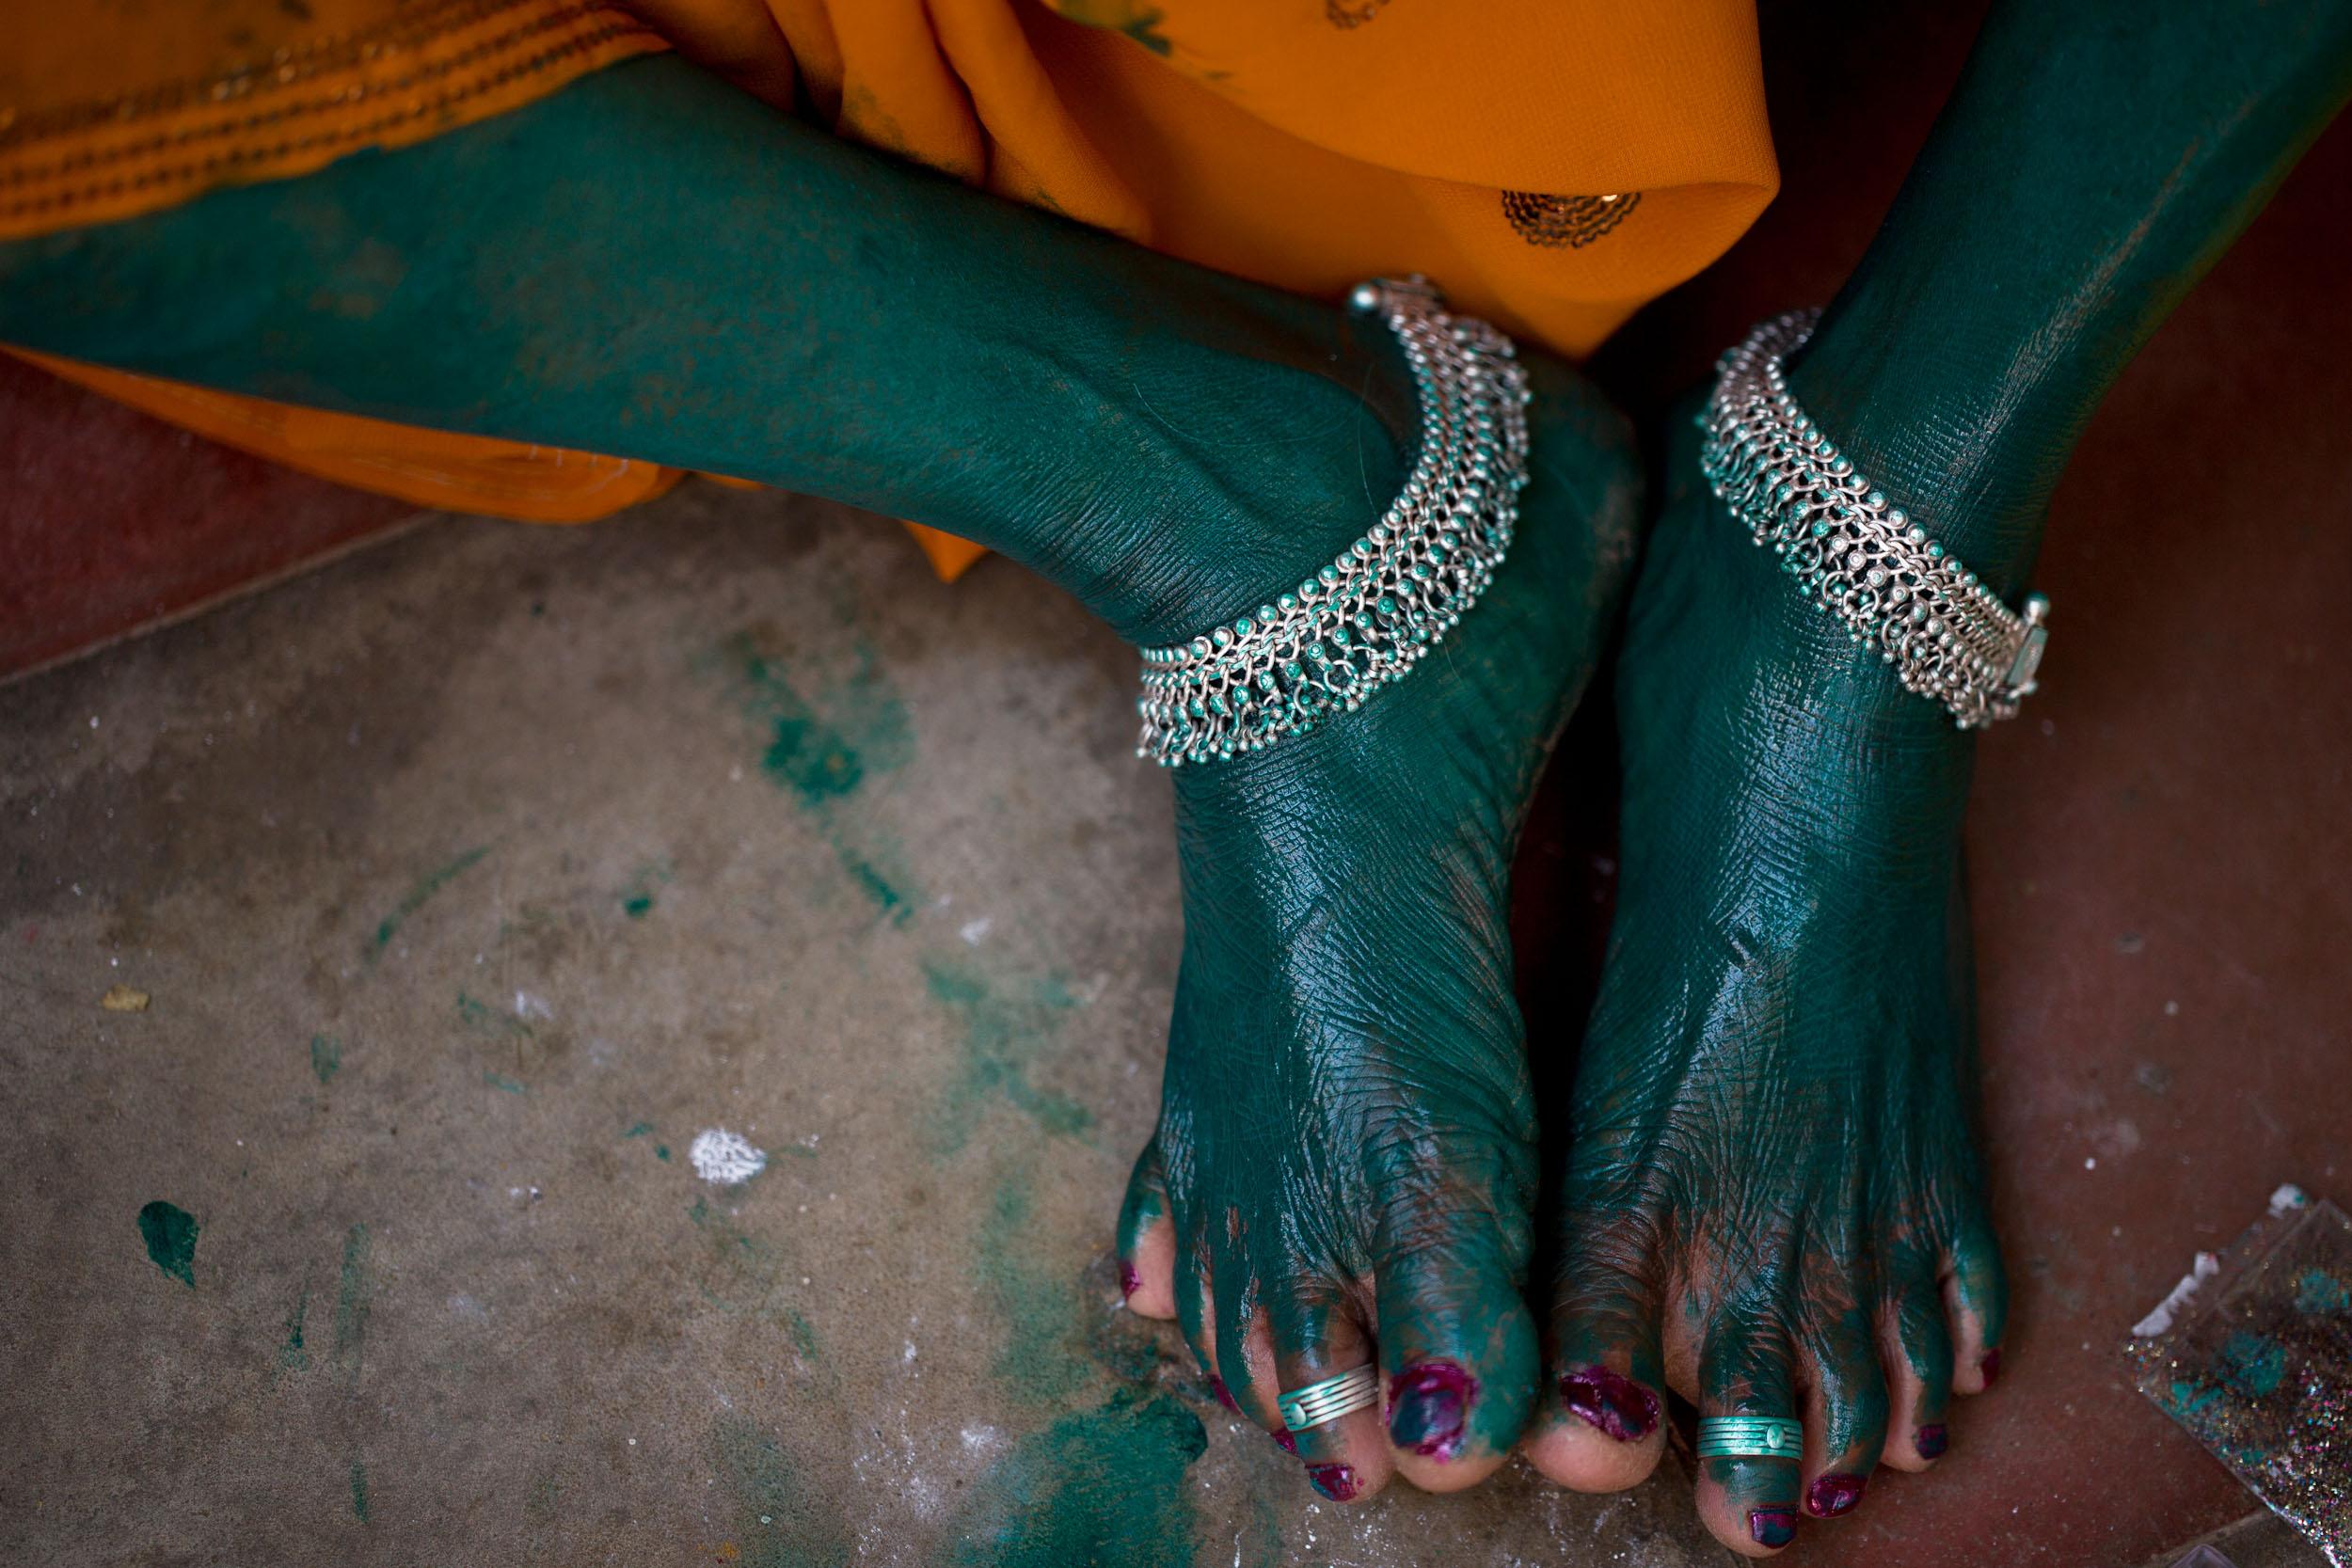 Sindhur_Photography_Travel_People_Art-A-4.JPG